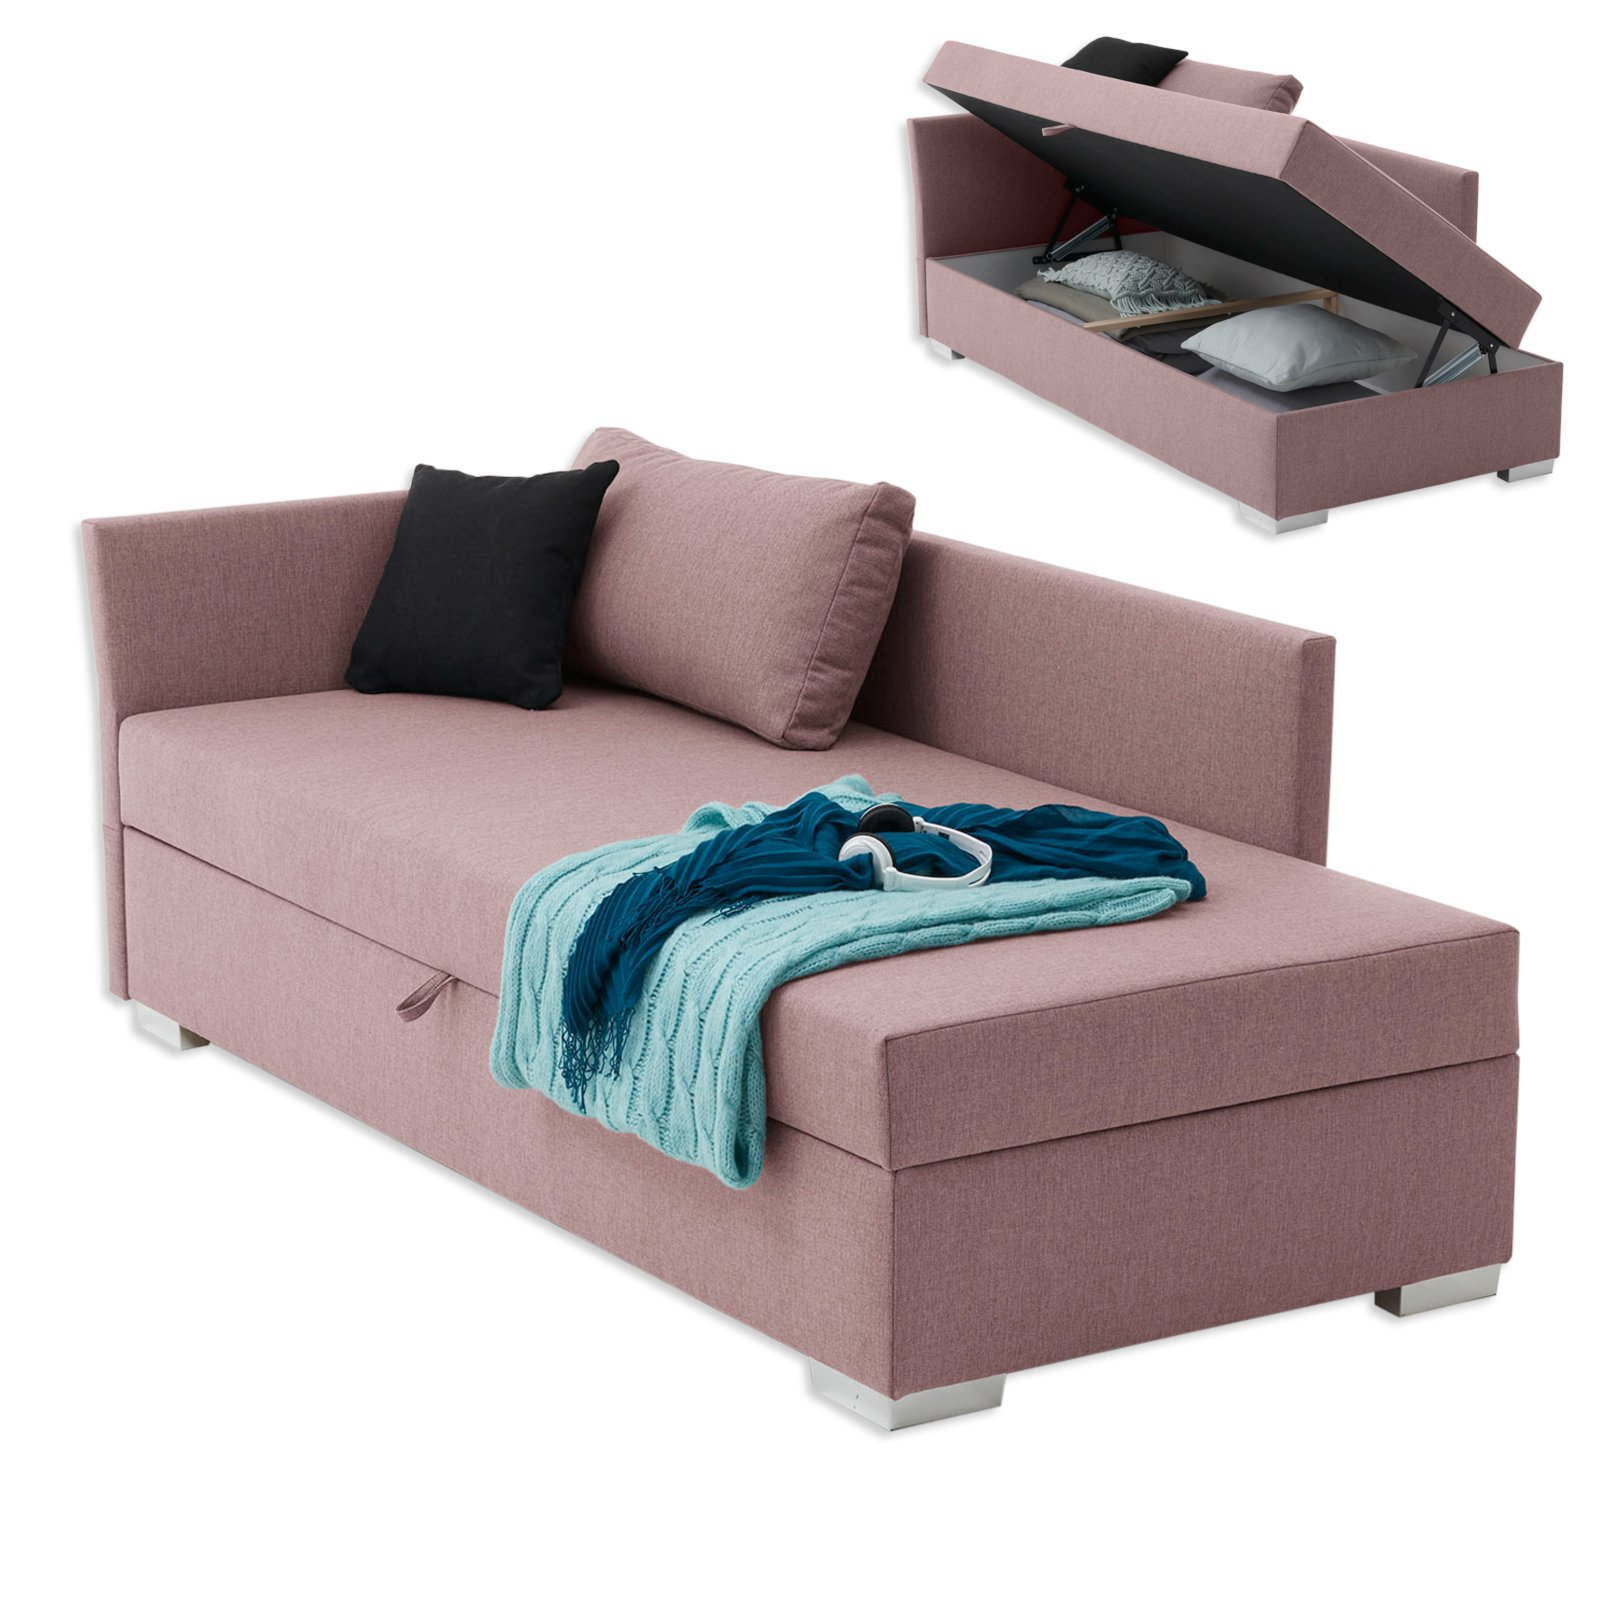 polsterliege havana rosa 90x200 cm mit staukasten. Black Bedroom Furniture Sets. Home Design Ideas